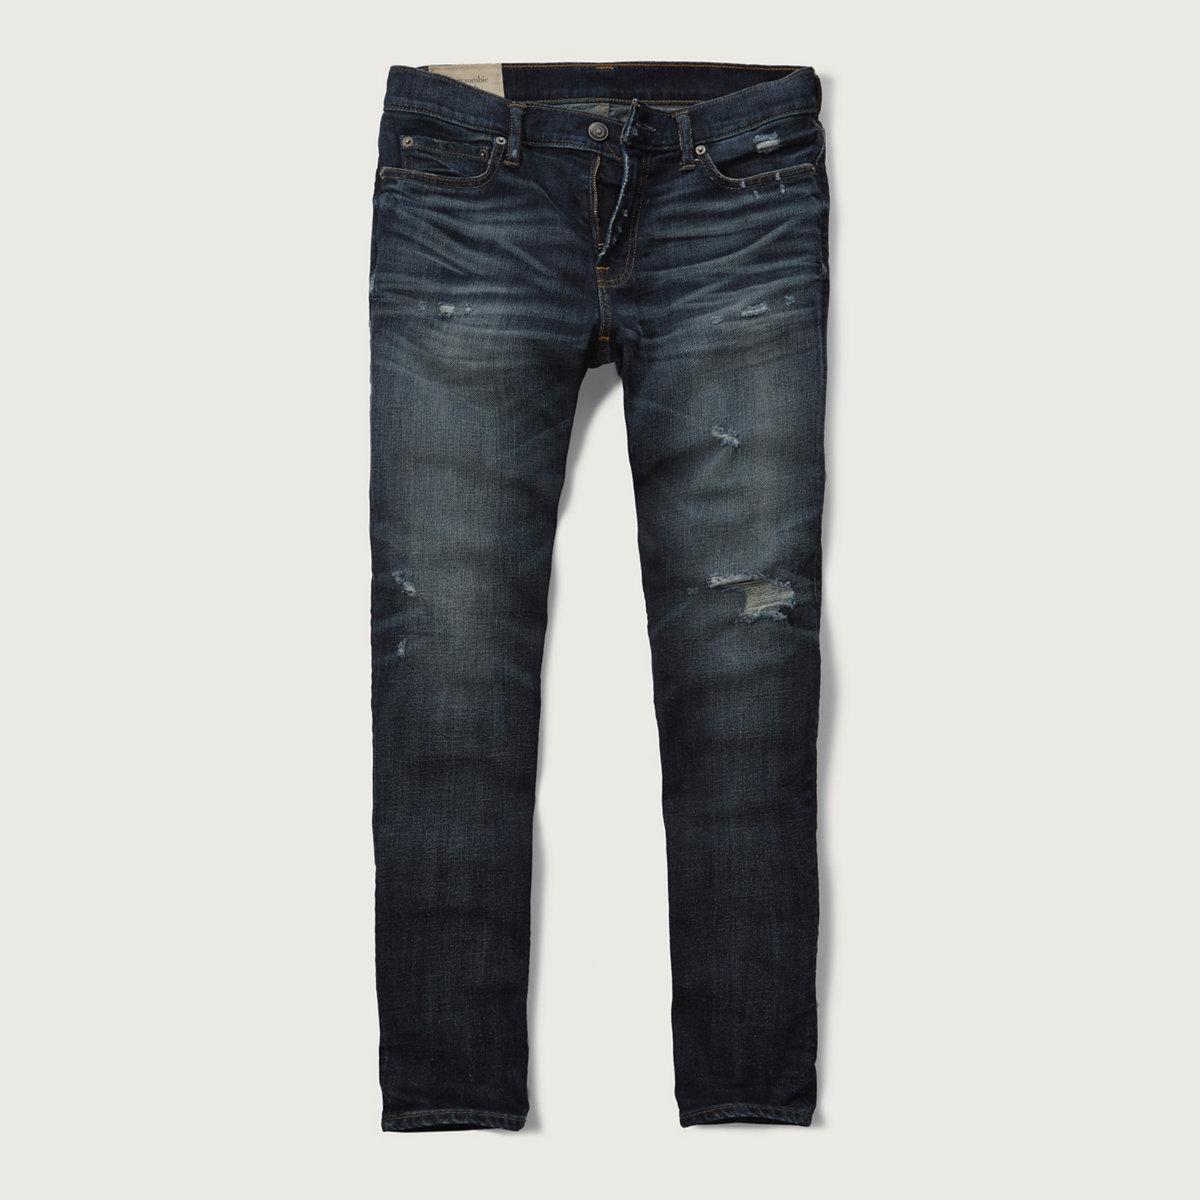 Super Skinny Everyday Jeans